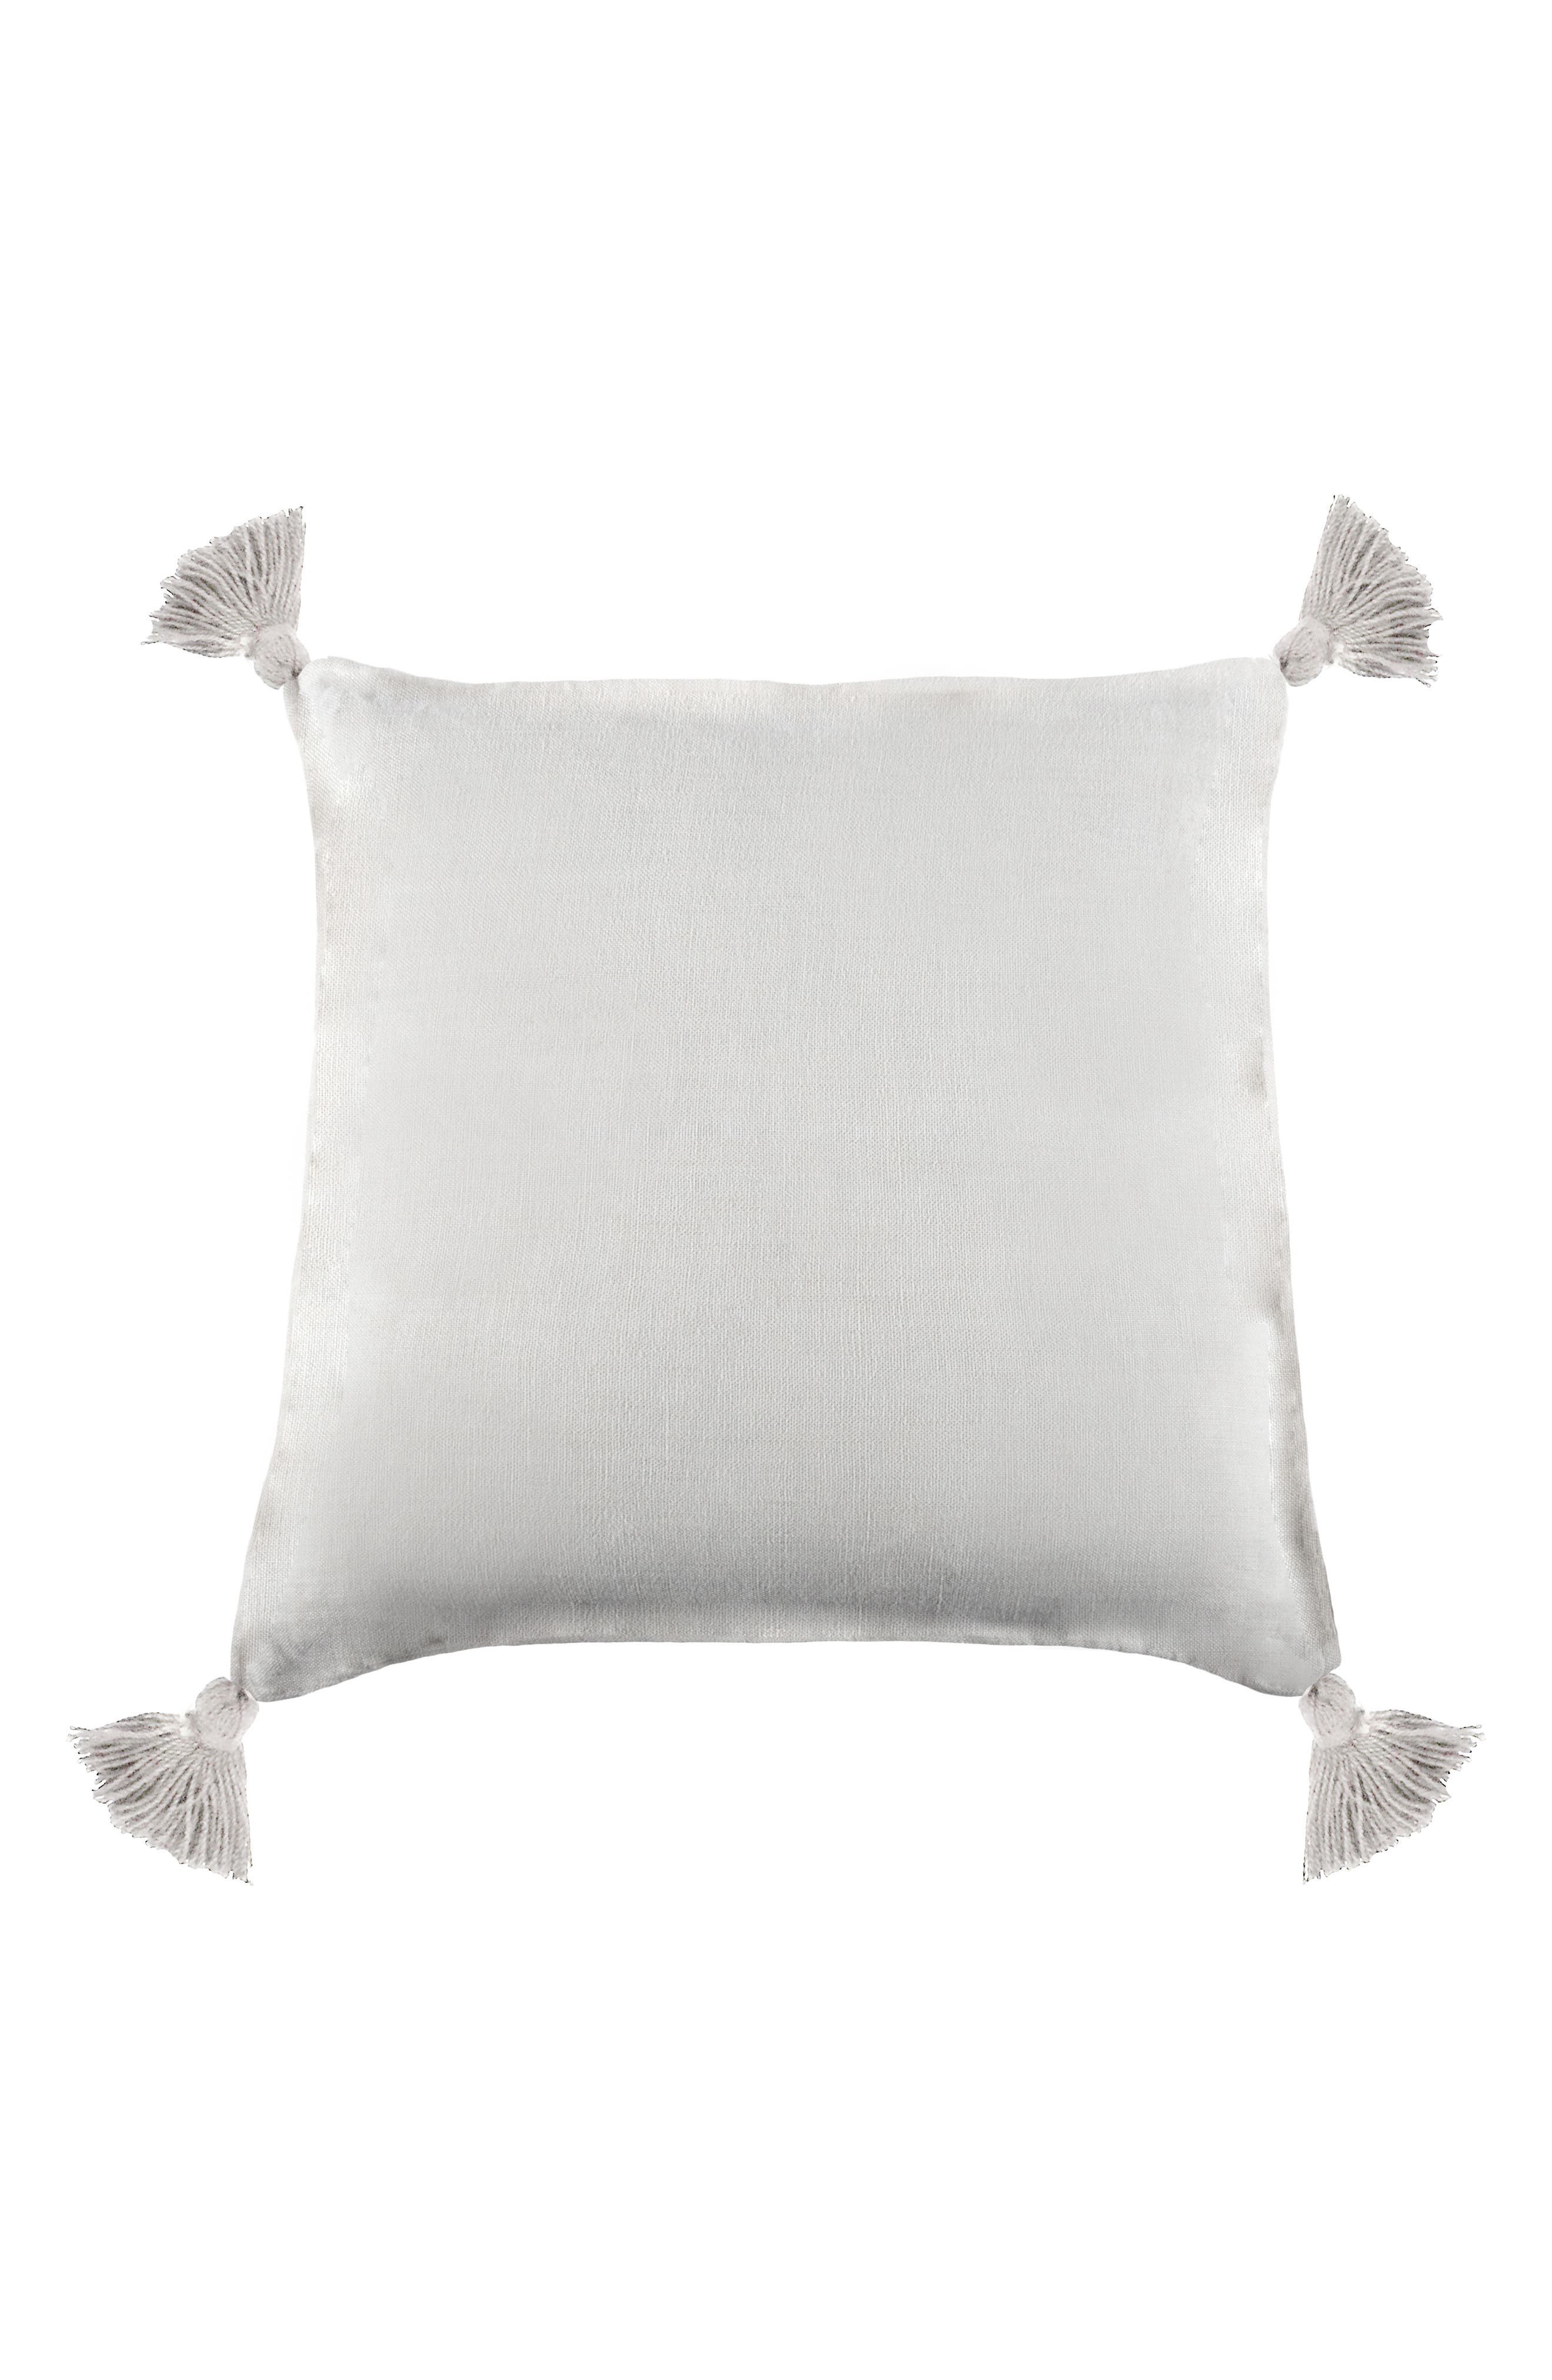 Pom Pom at Home Montauk Tassel Accent Pillow